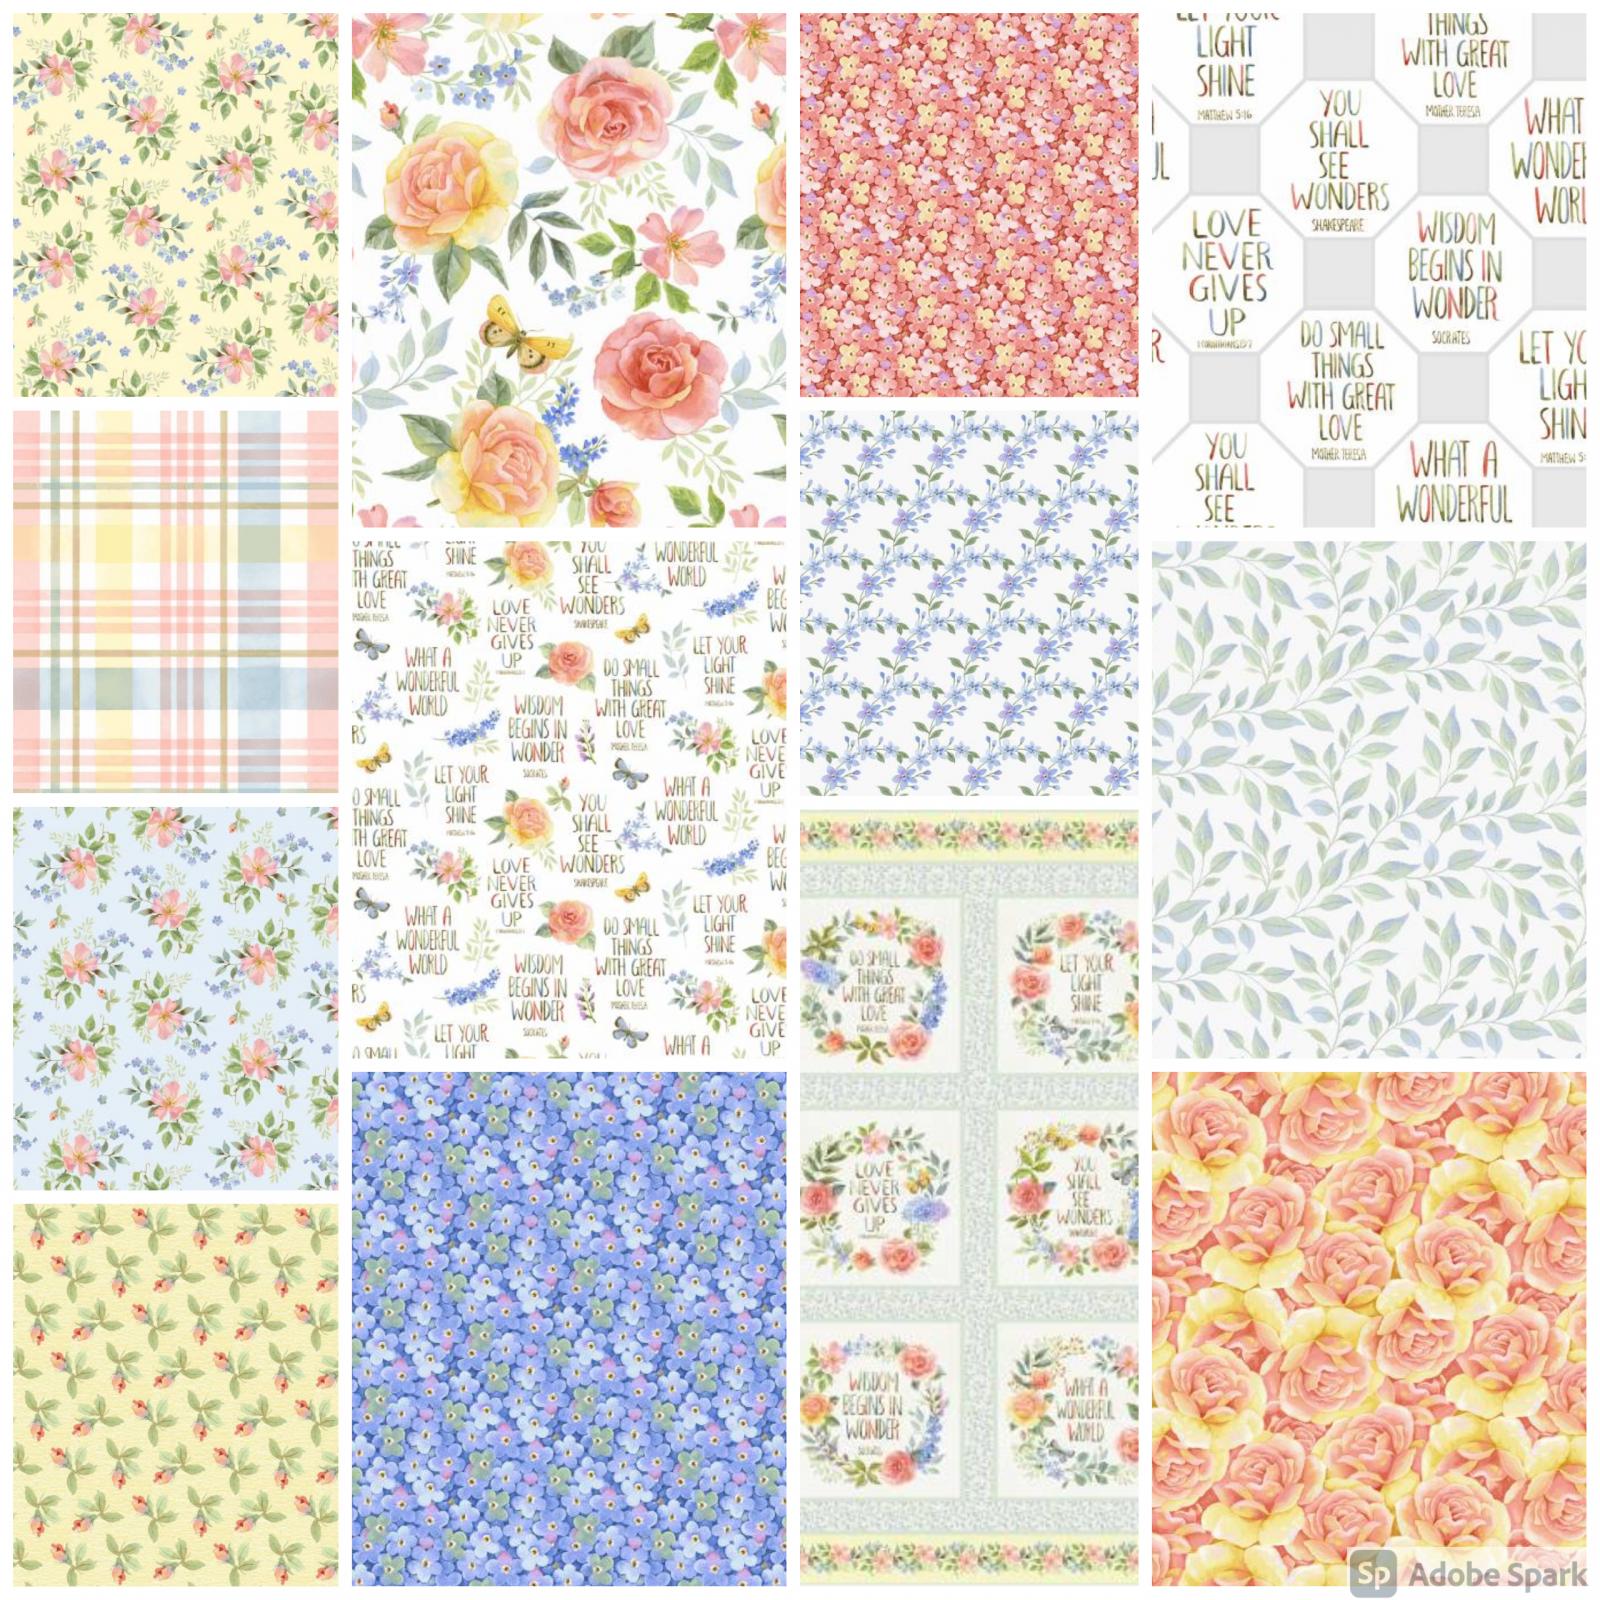 Garden Inspiration - Fat Quarter Bundle - By Jane Allison for Henry Glass Co.